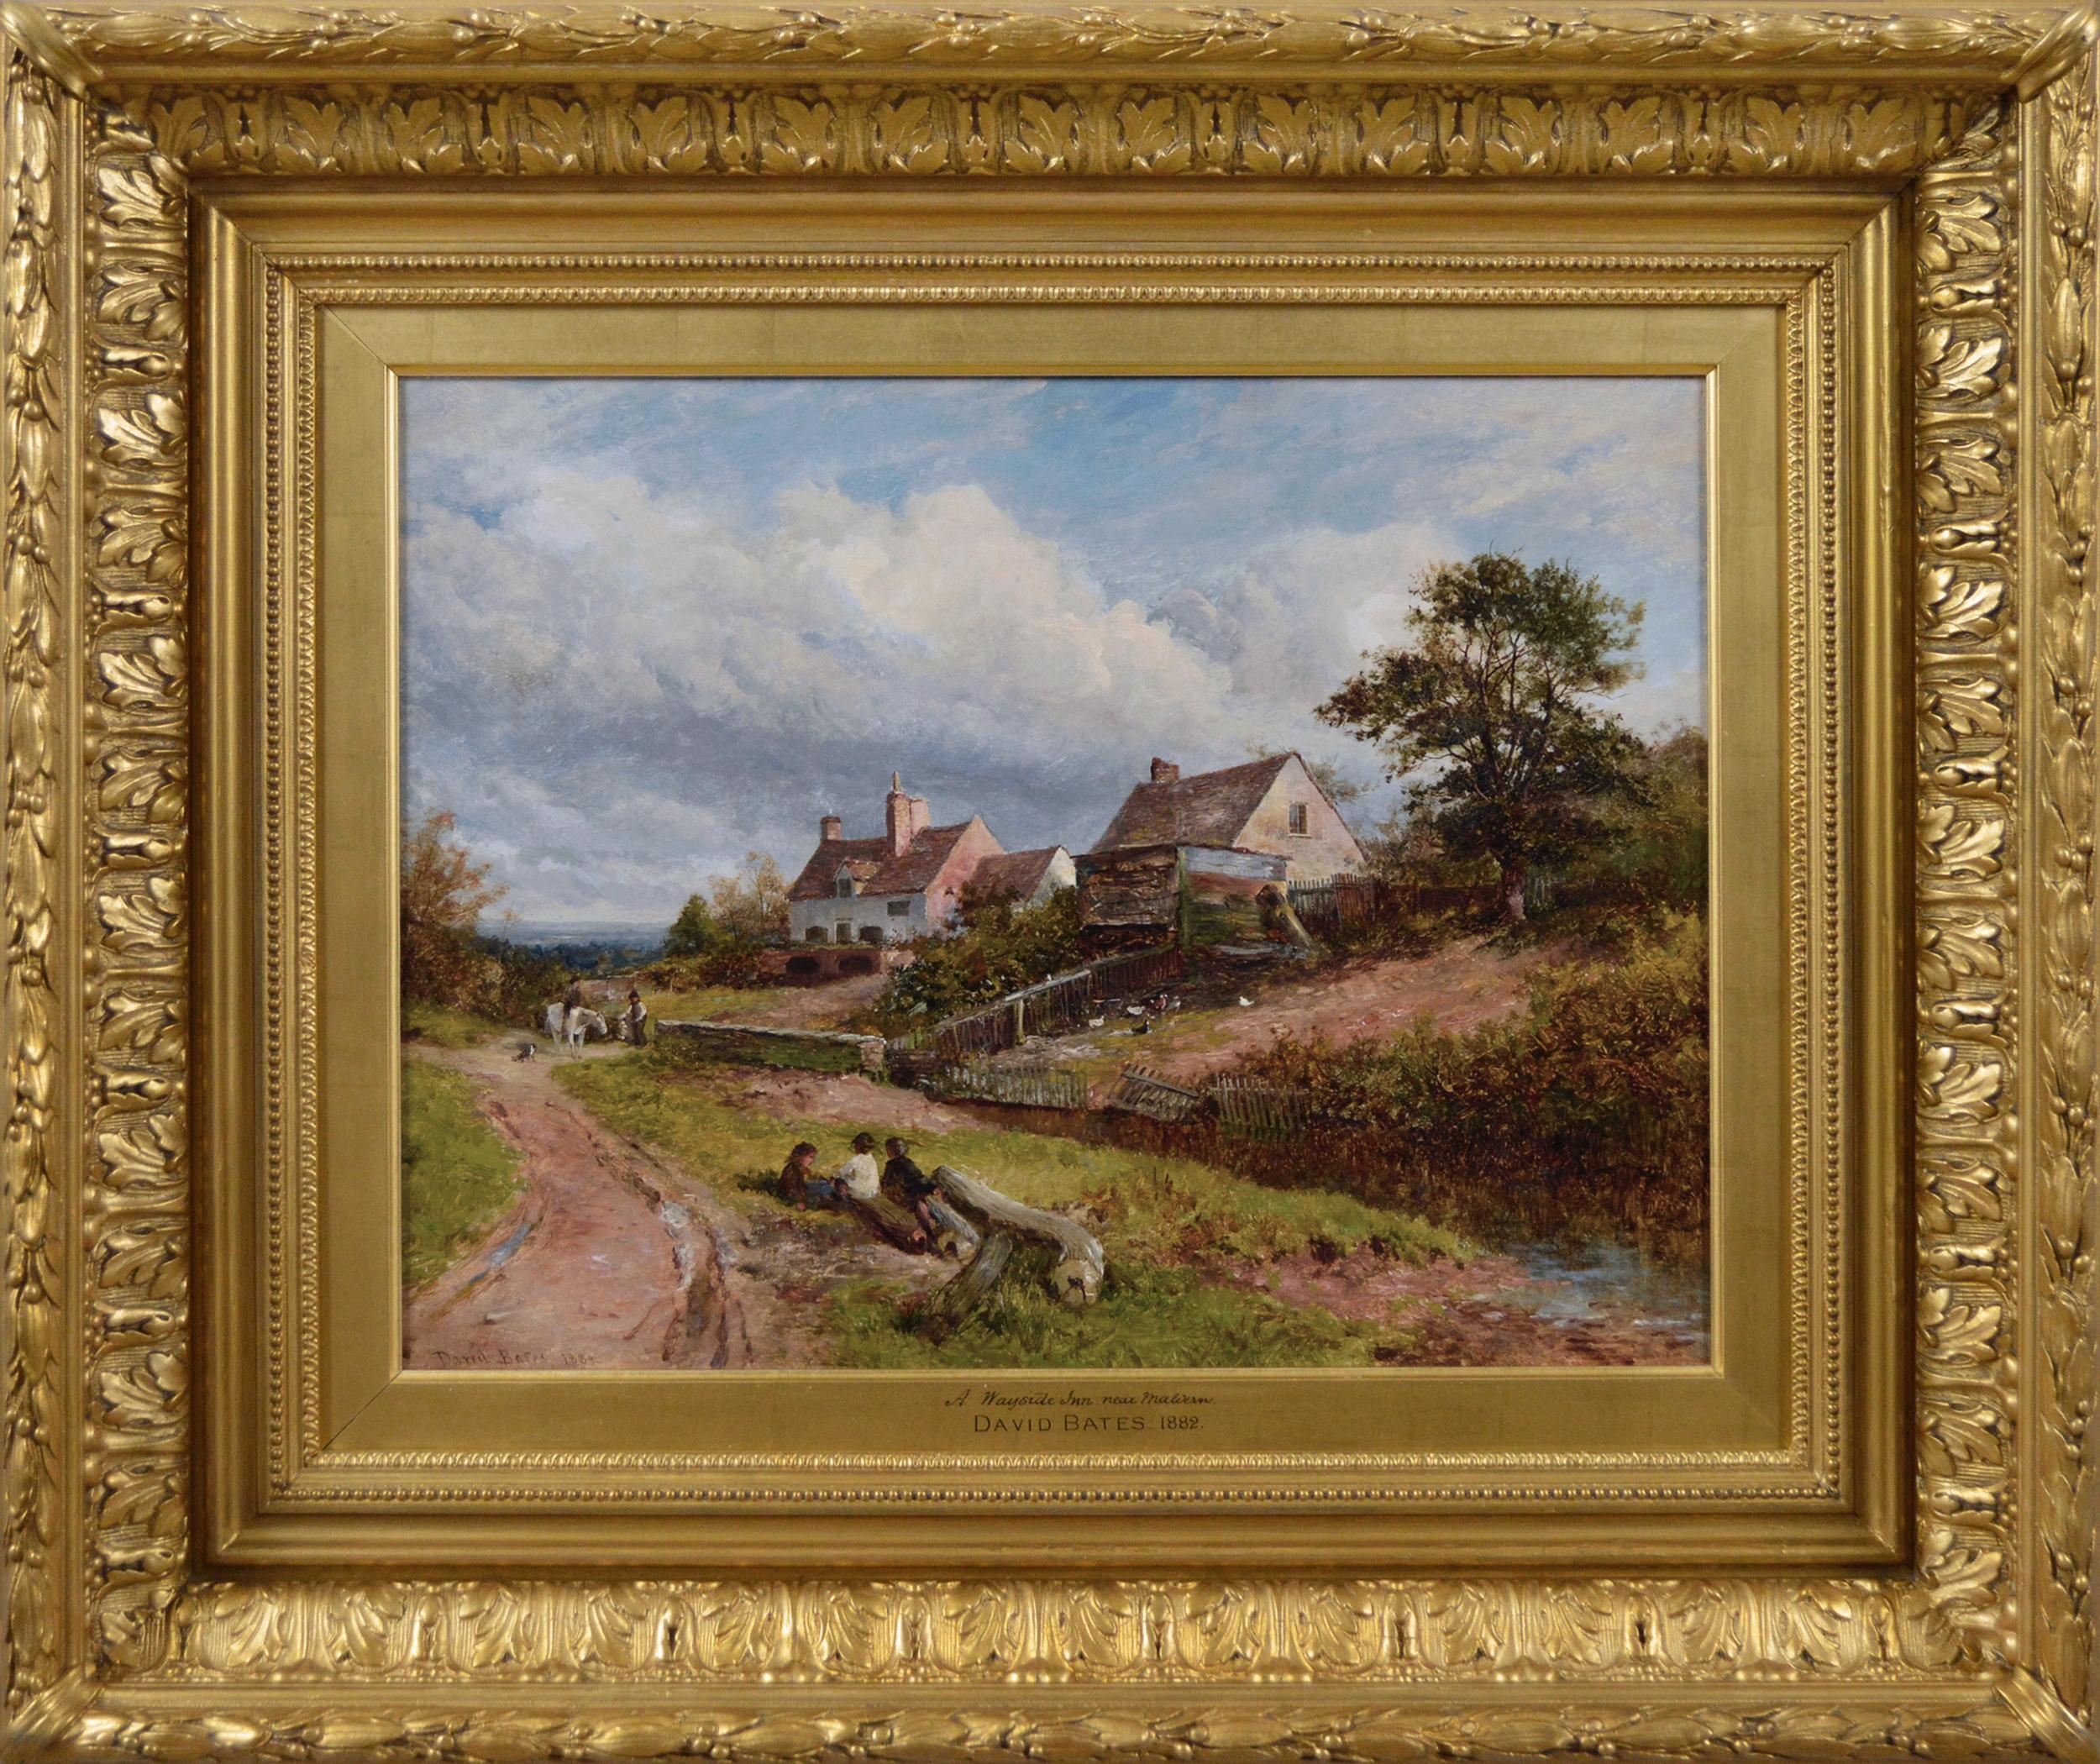 19th Century Landscape oil painting of an Inn near Malvern, Worcestershire